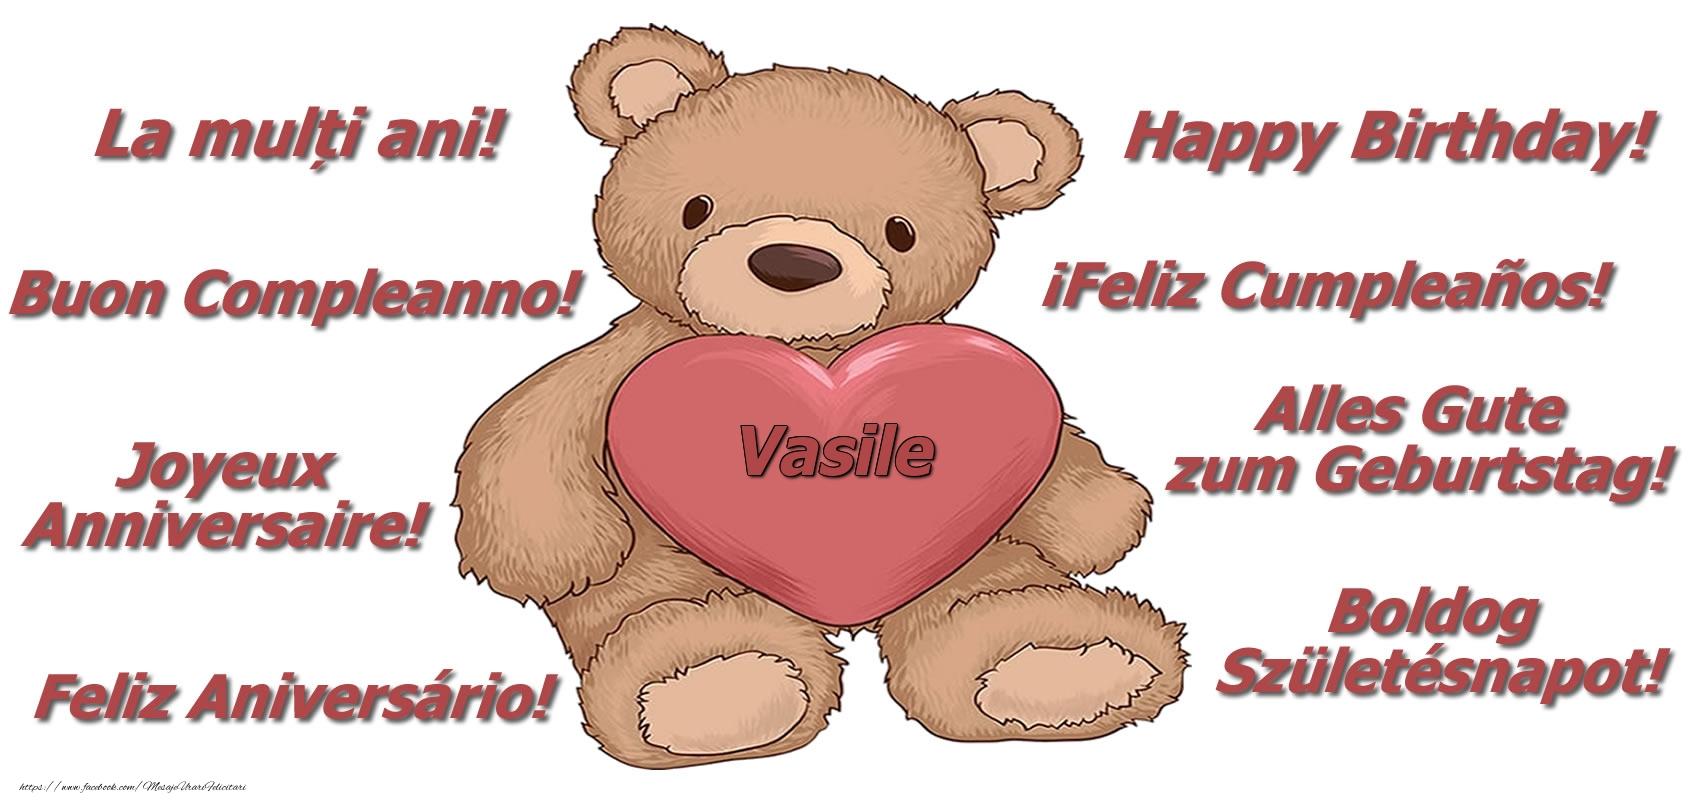 Felicitari de zi de nastere - La multi ani Vasile! - Ursulet